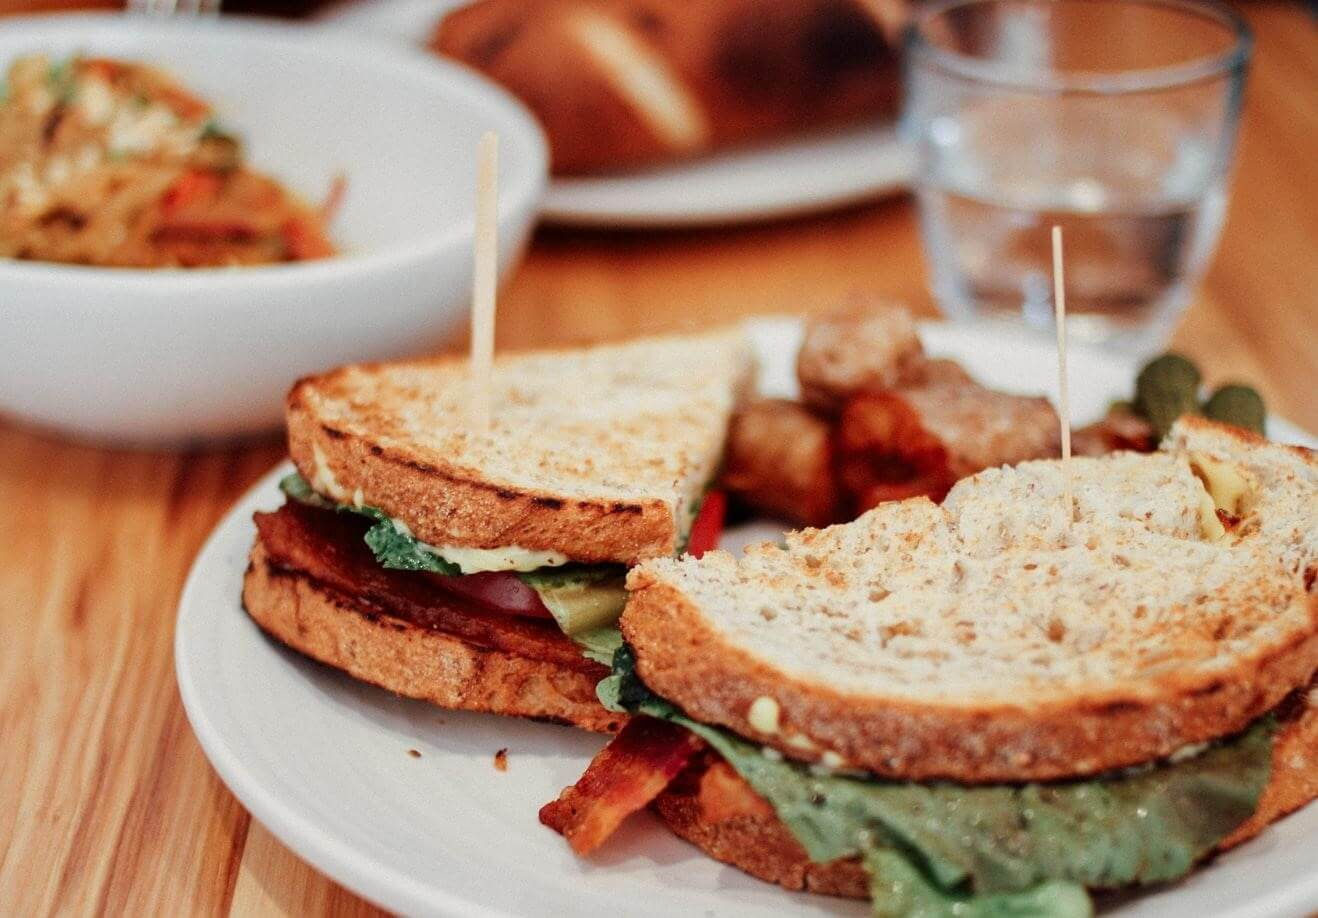 5 good eating habits